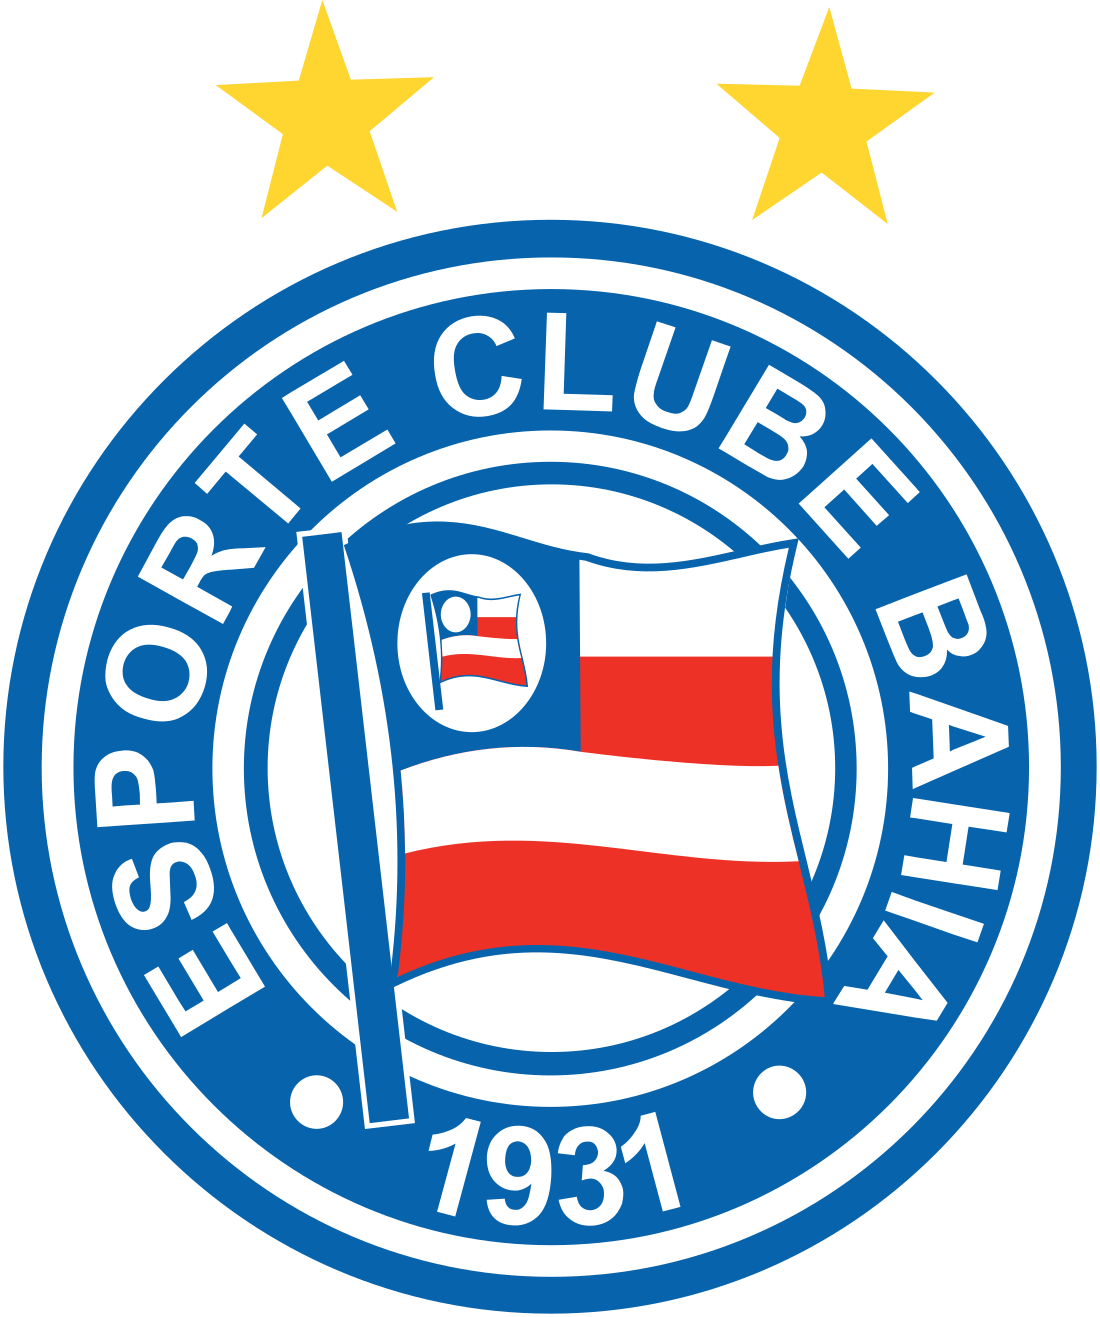 e-c-bahia-logo-escudo-4